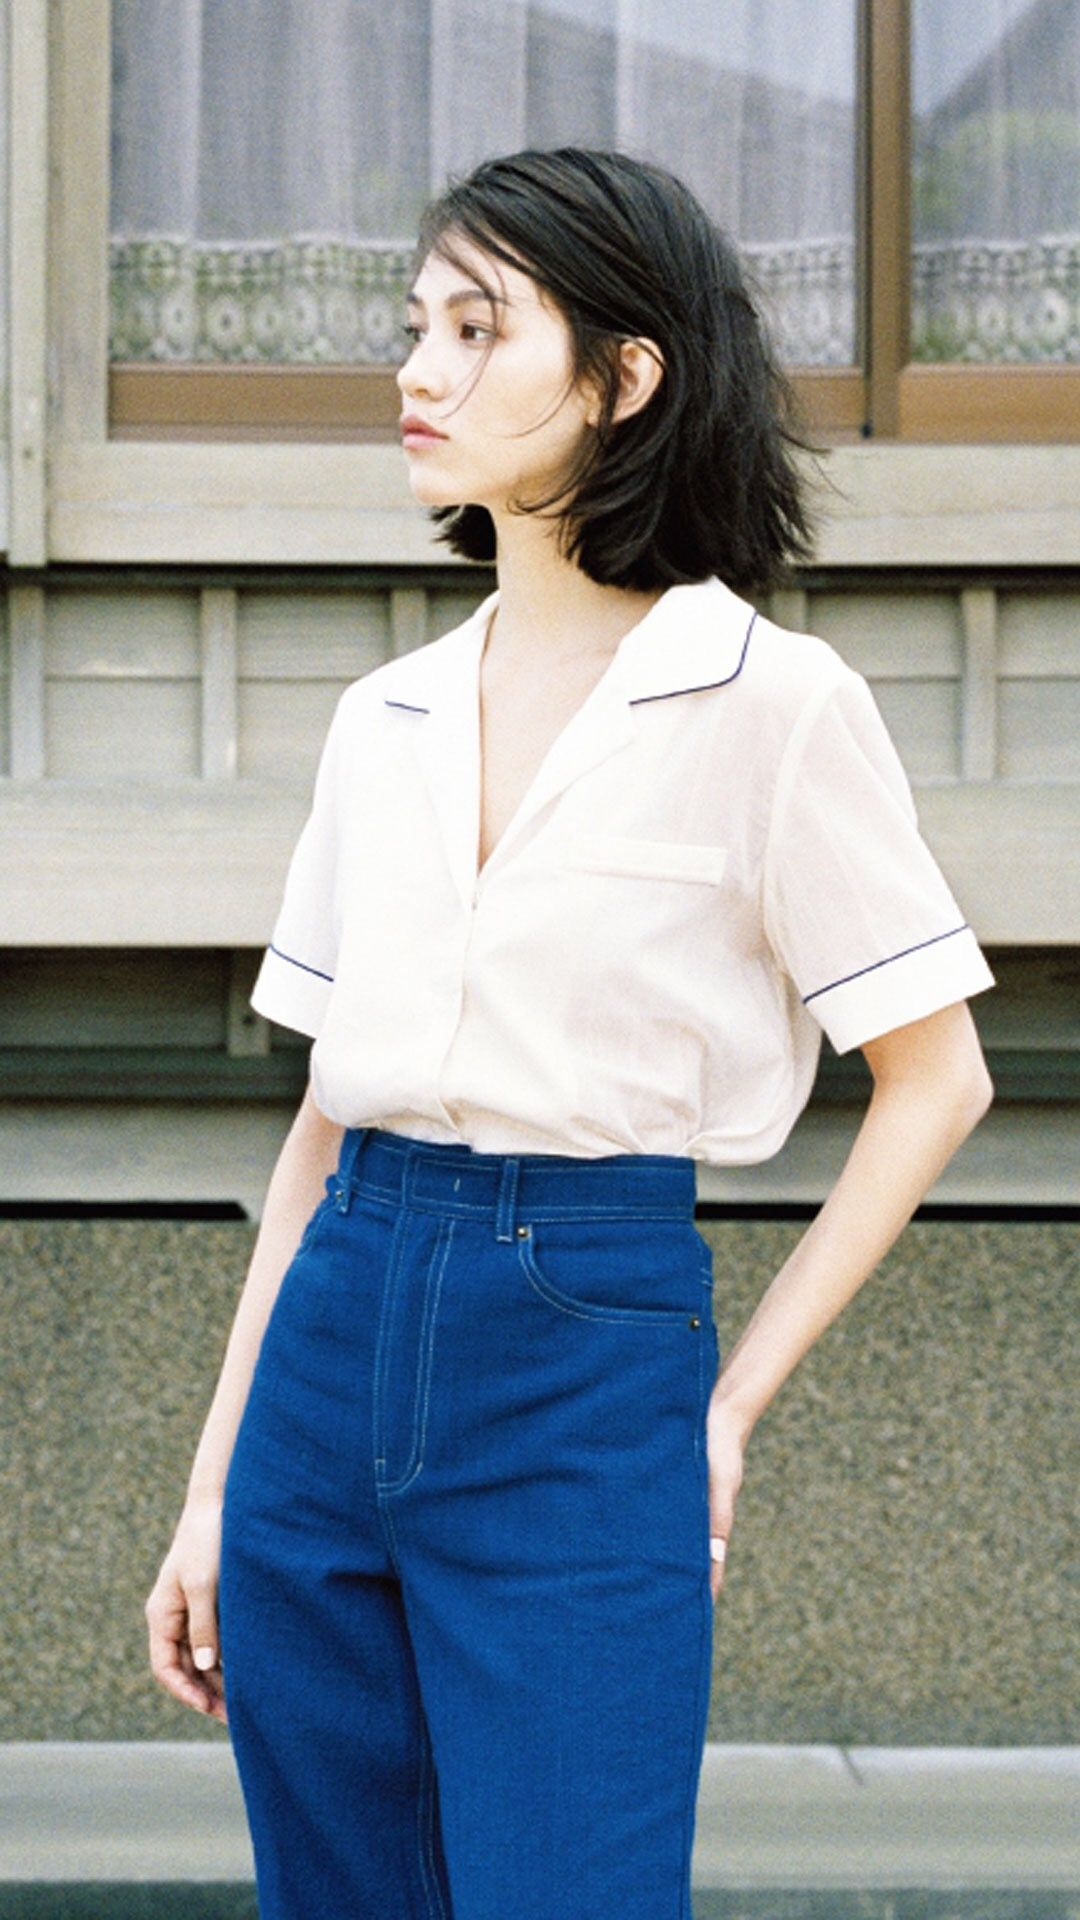 Kiko Mizuhara | 2018 summer look for fukuoka trip | Fashion